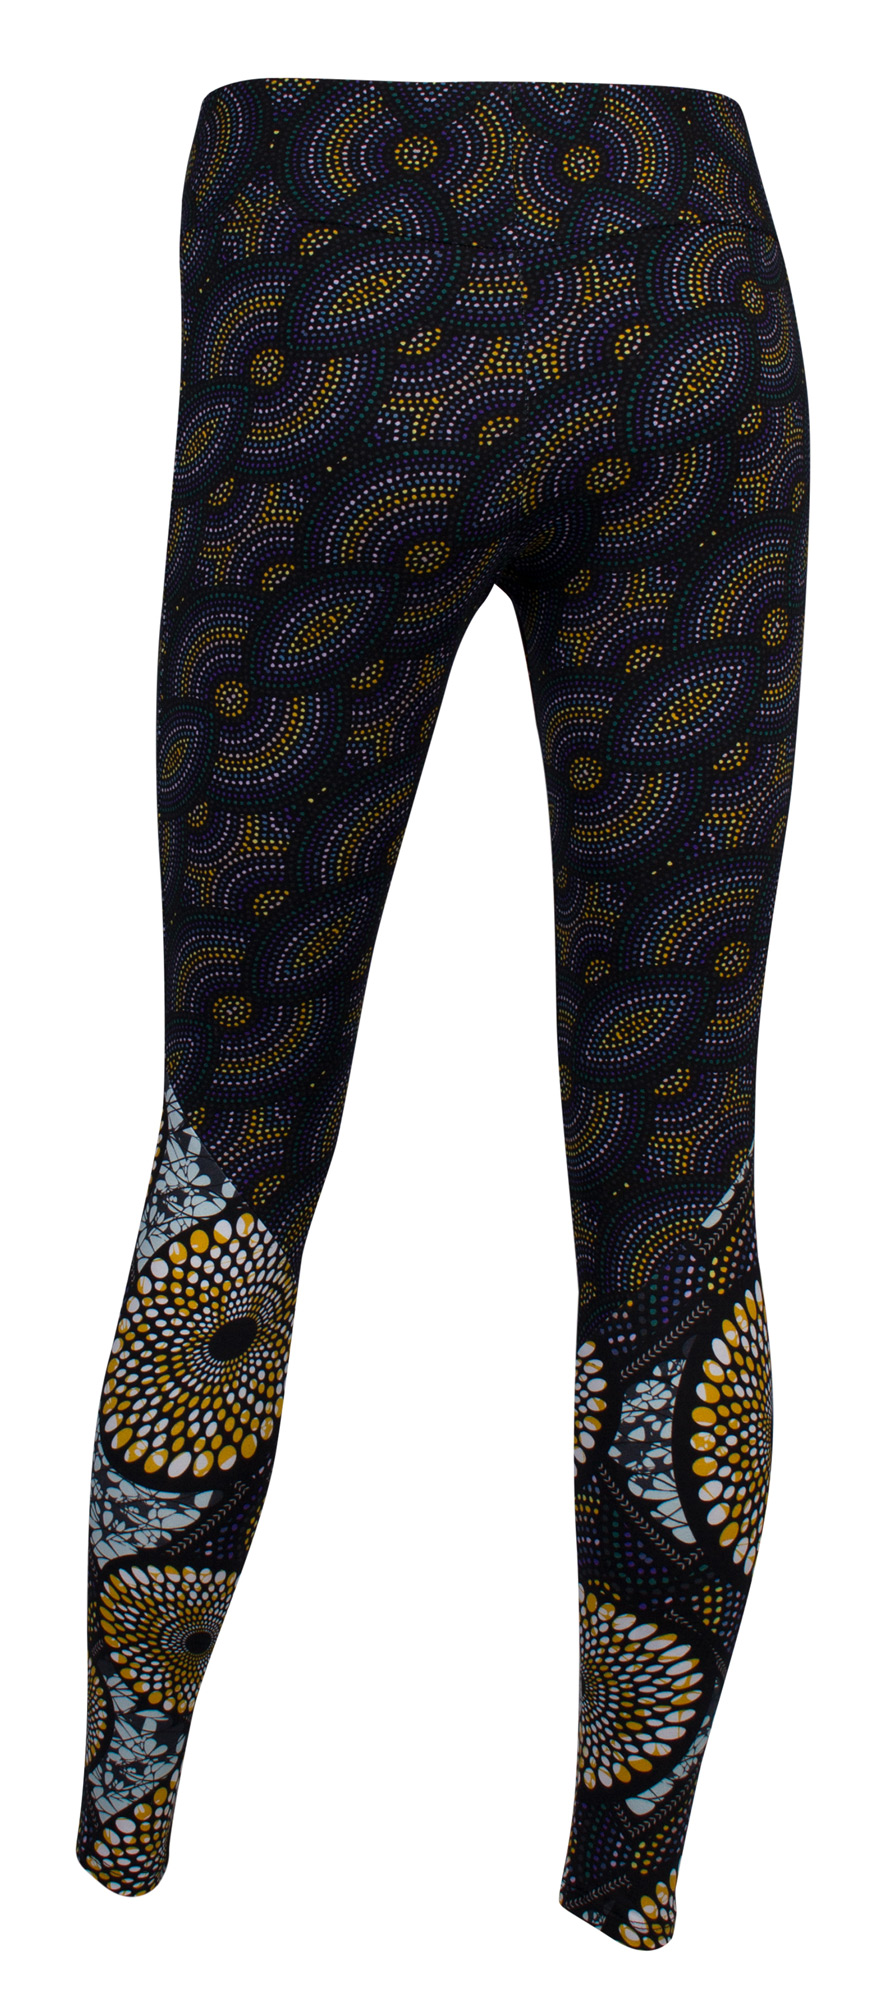 "Yoga-Leggings ""Madagaskar"" - blue/yellow"